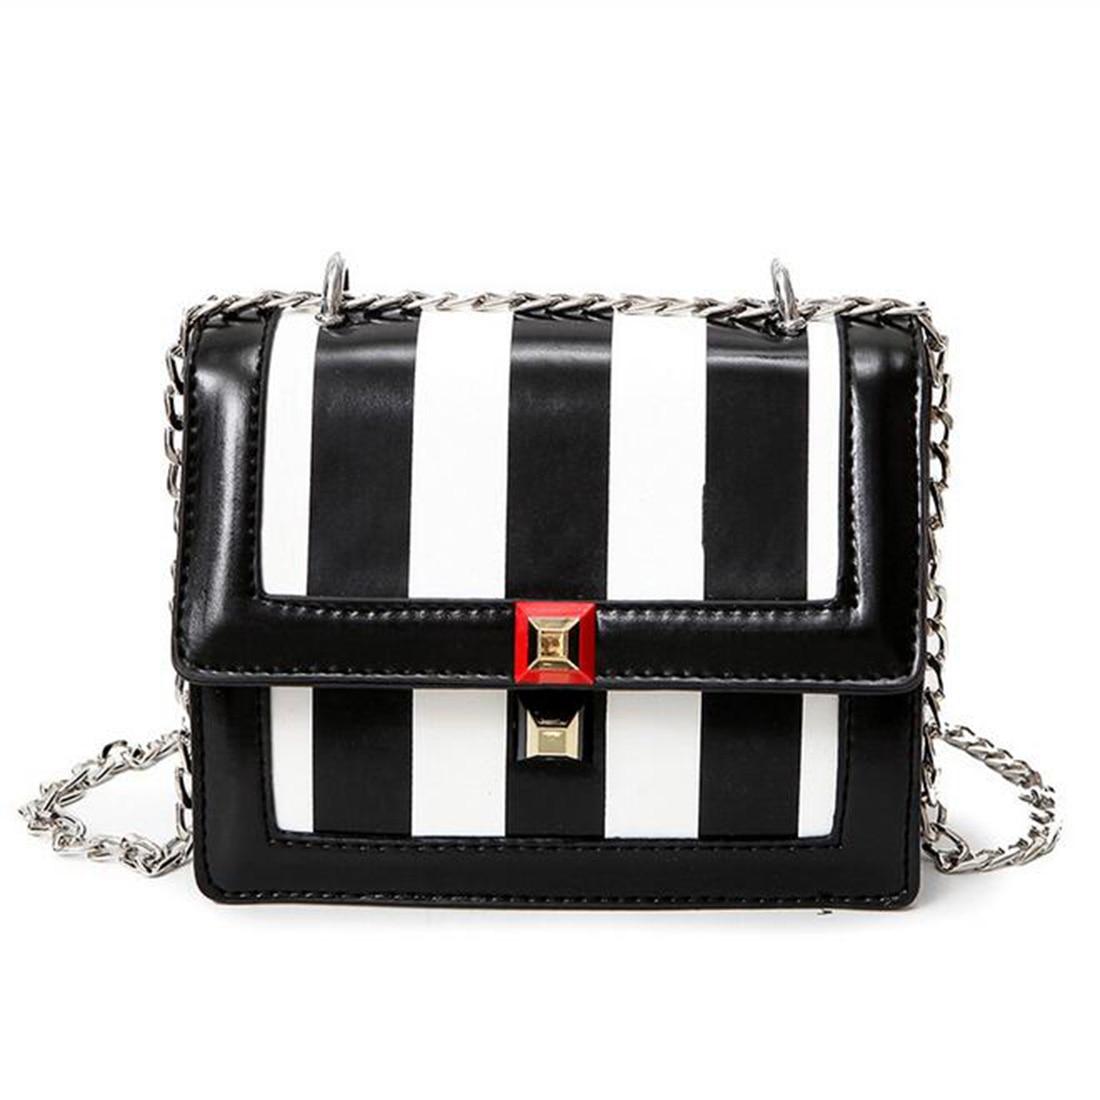 brand designer bags women black white leather handbags Chain Solid Shoulder Bag mini bags Woman Messenger Bag purses and handbag мебельтрия стул гамма т1